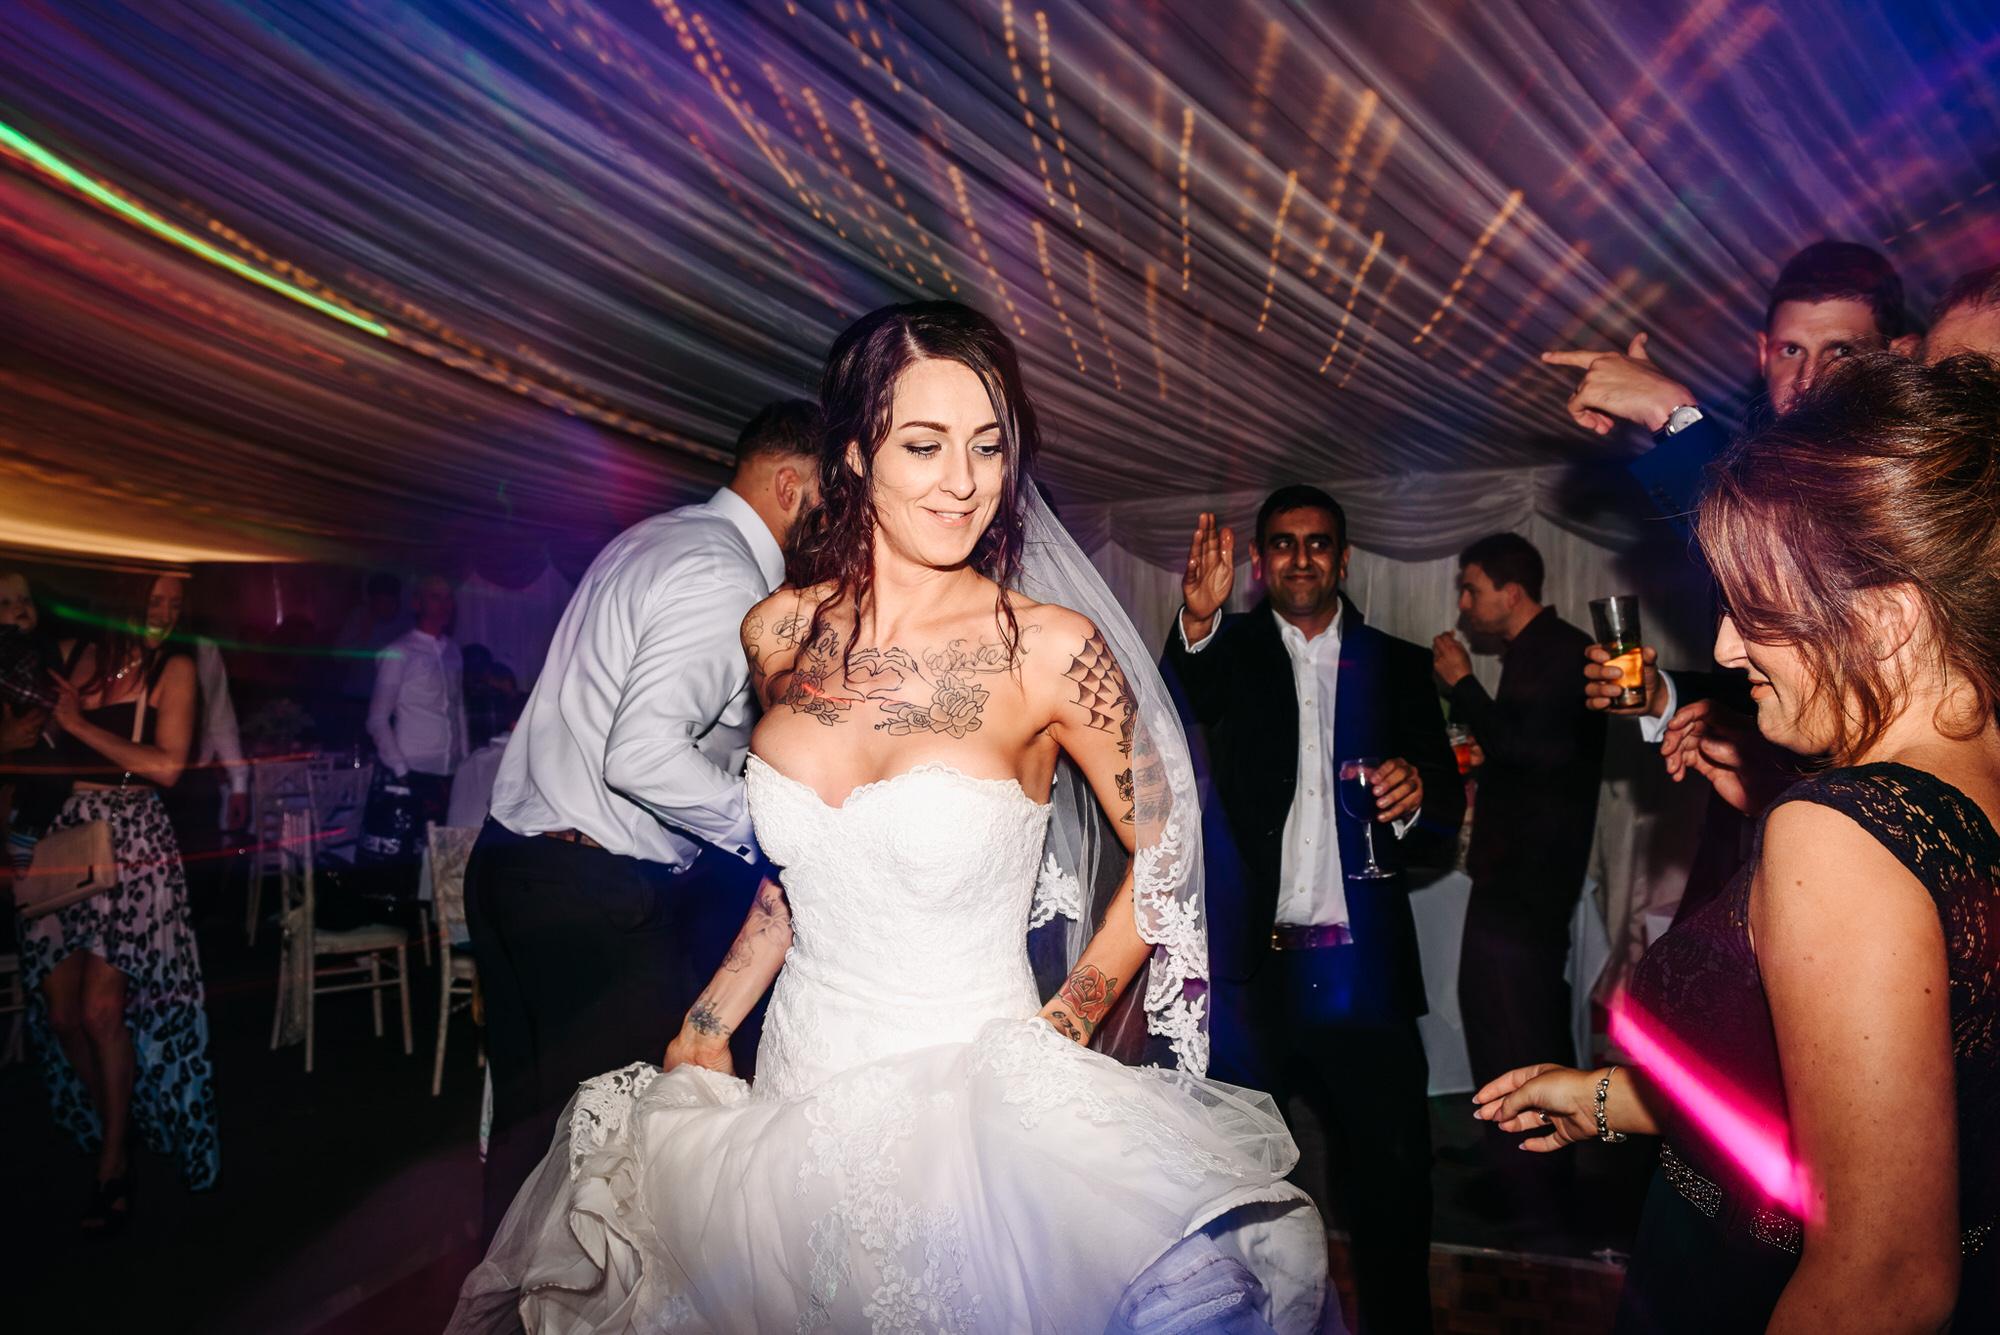 Best Of Yorkshire Wedding Photography 2017 - Martyn Hand-21.jpg